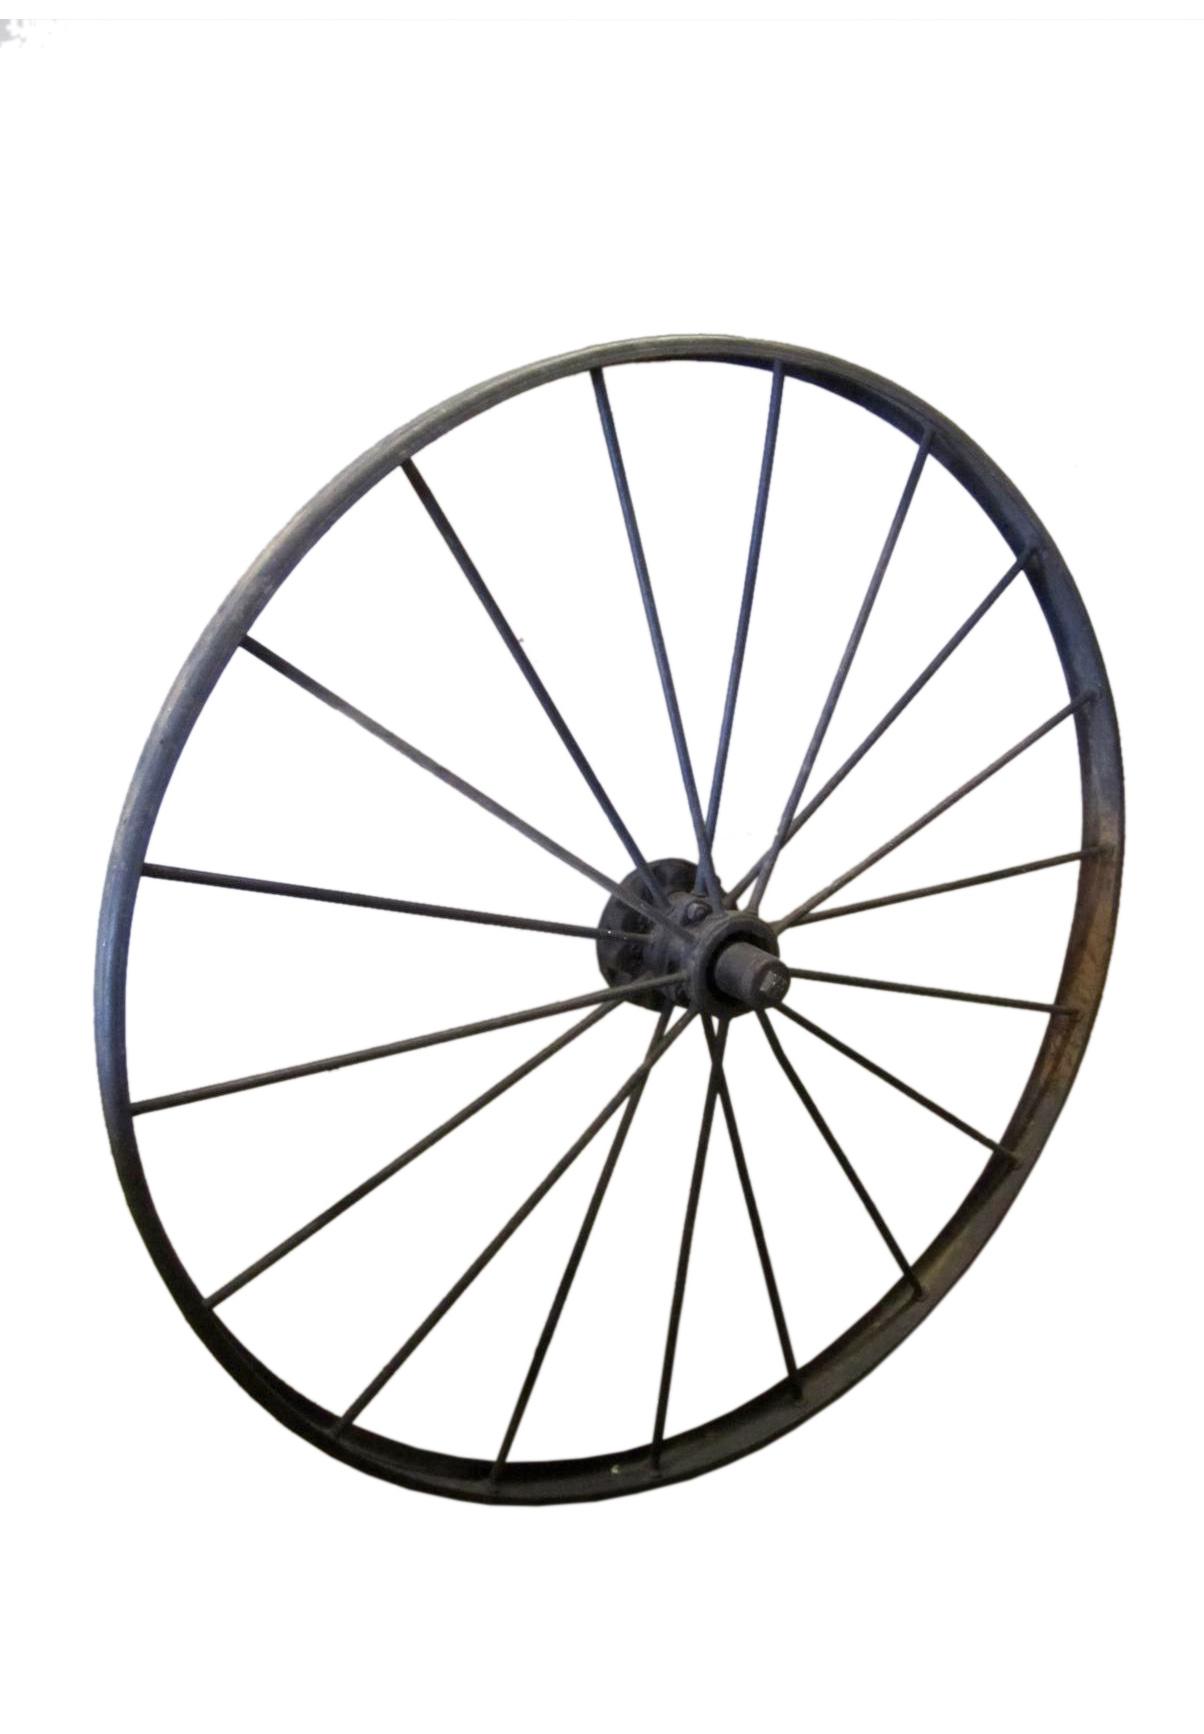 Decorative Metal Wagon Wheel Chairish